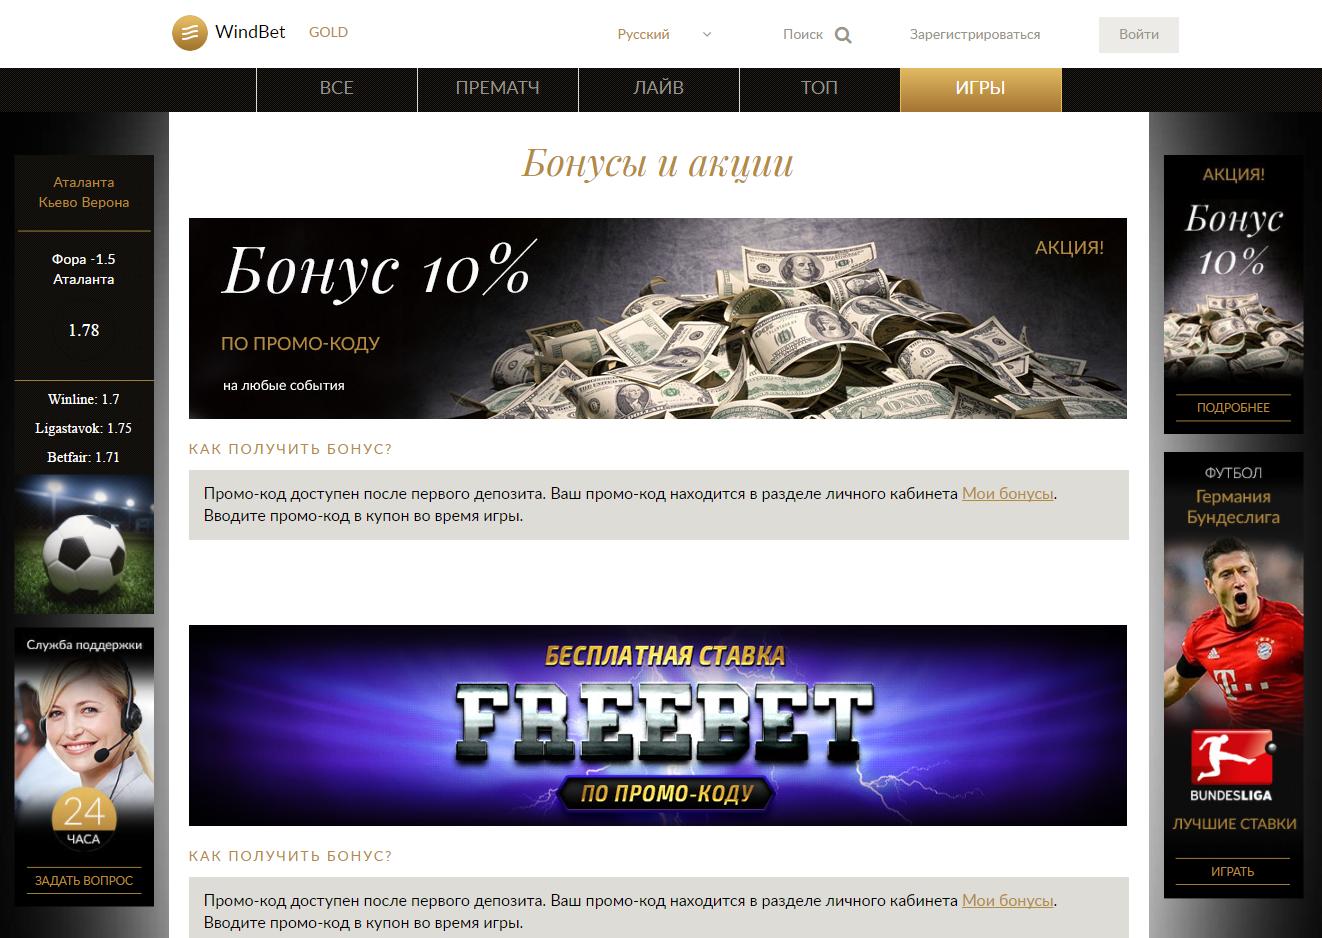 Акции и бонусы в БК Windbet